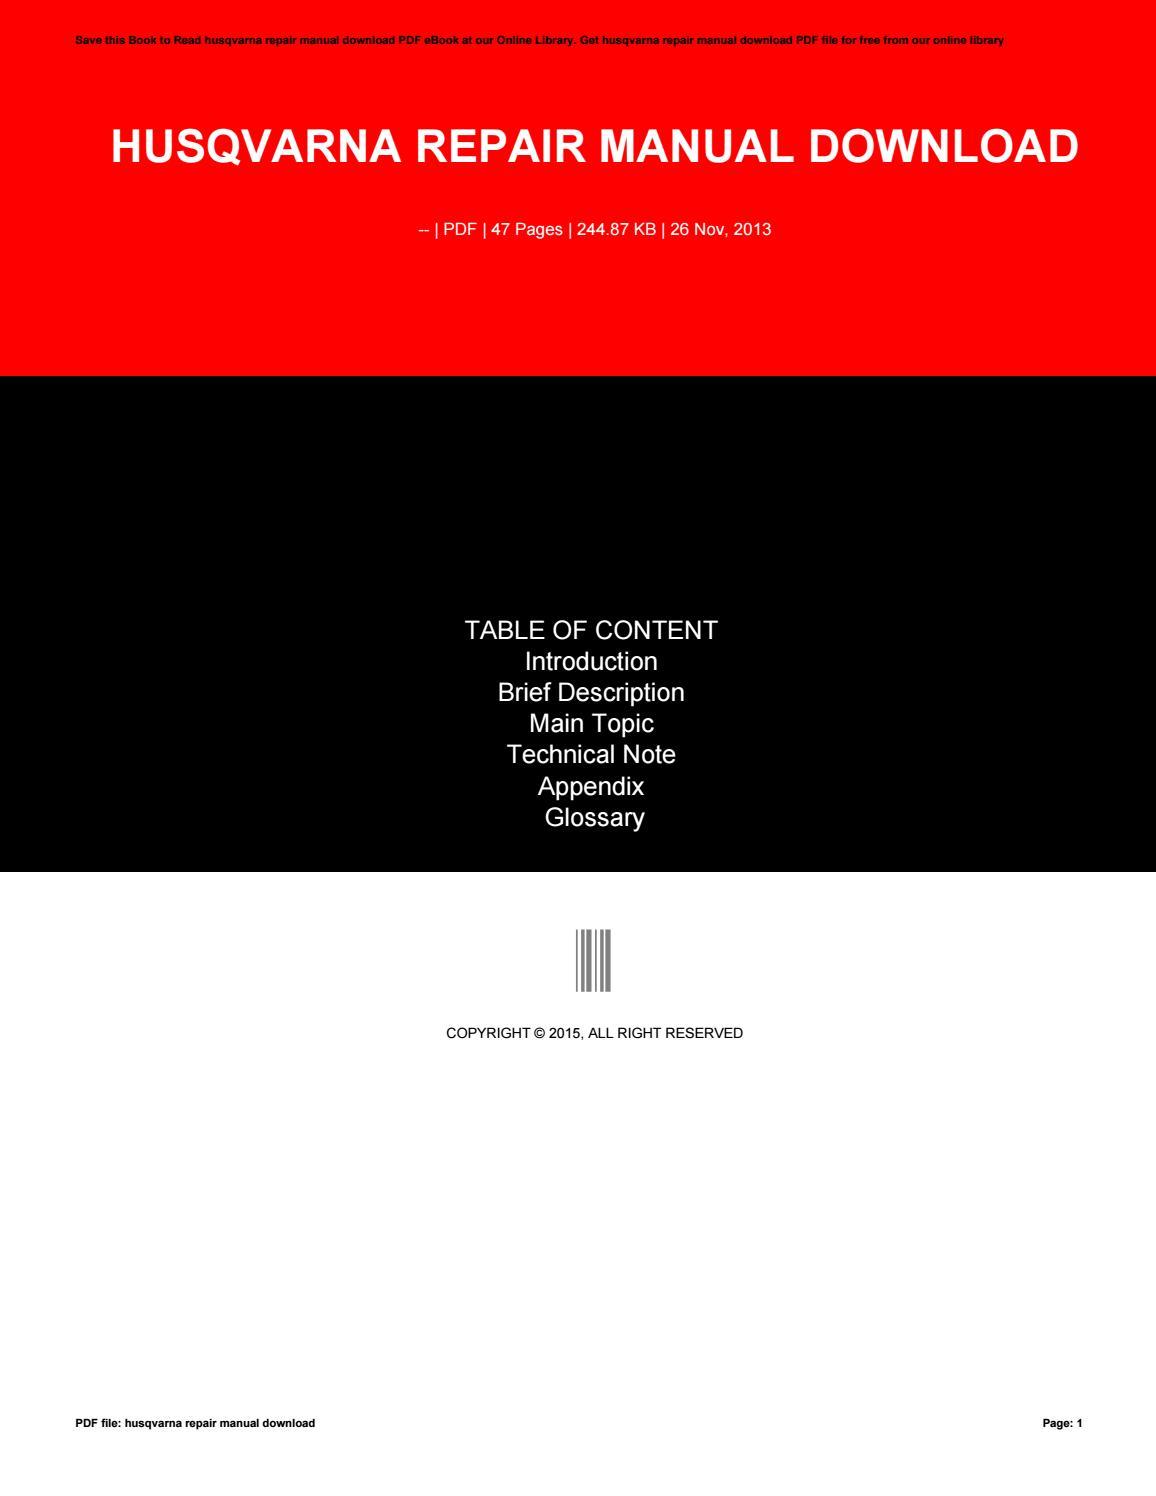 husqvarna wr250 service repair manual pdf 06 ebook